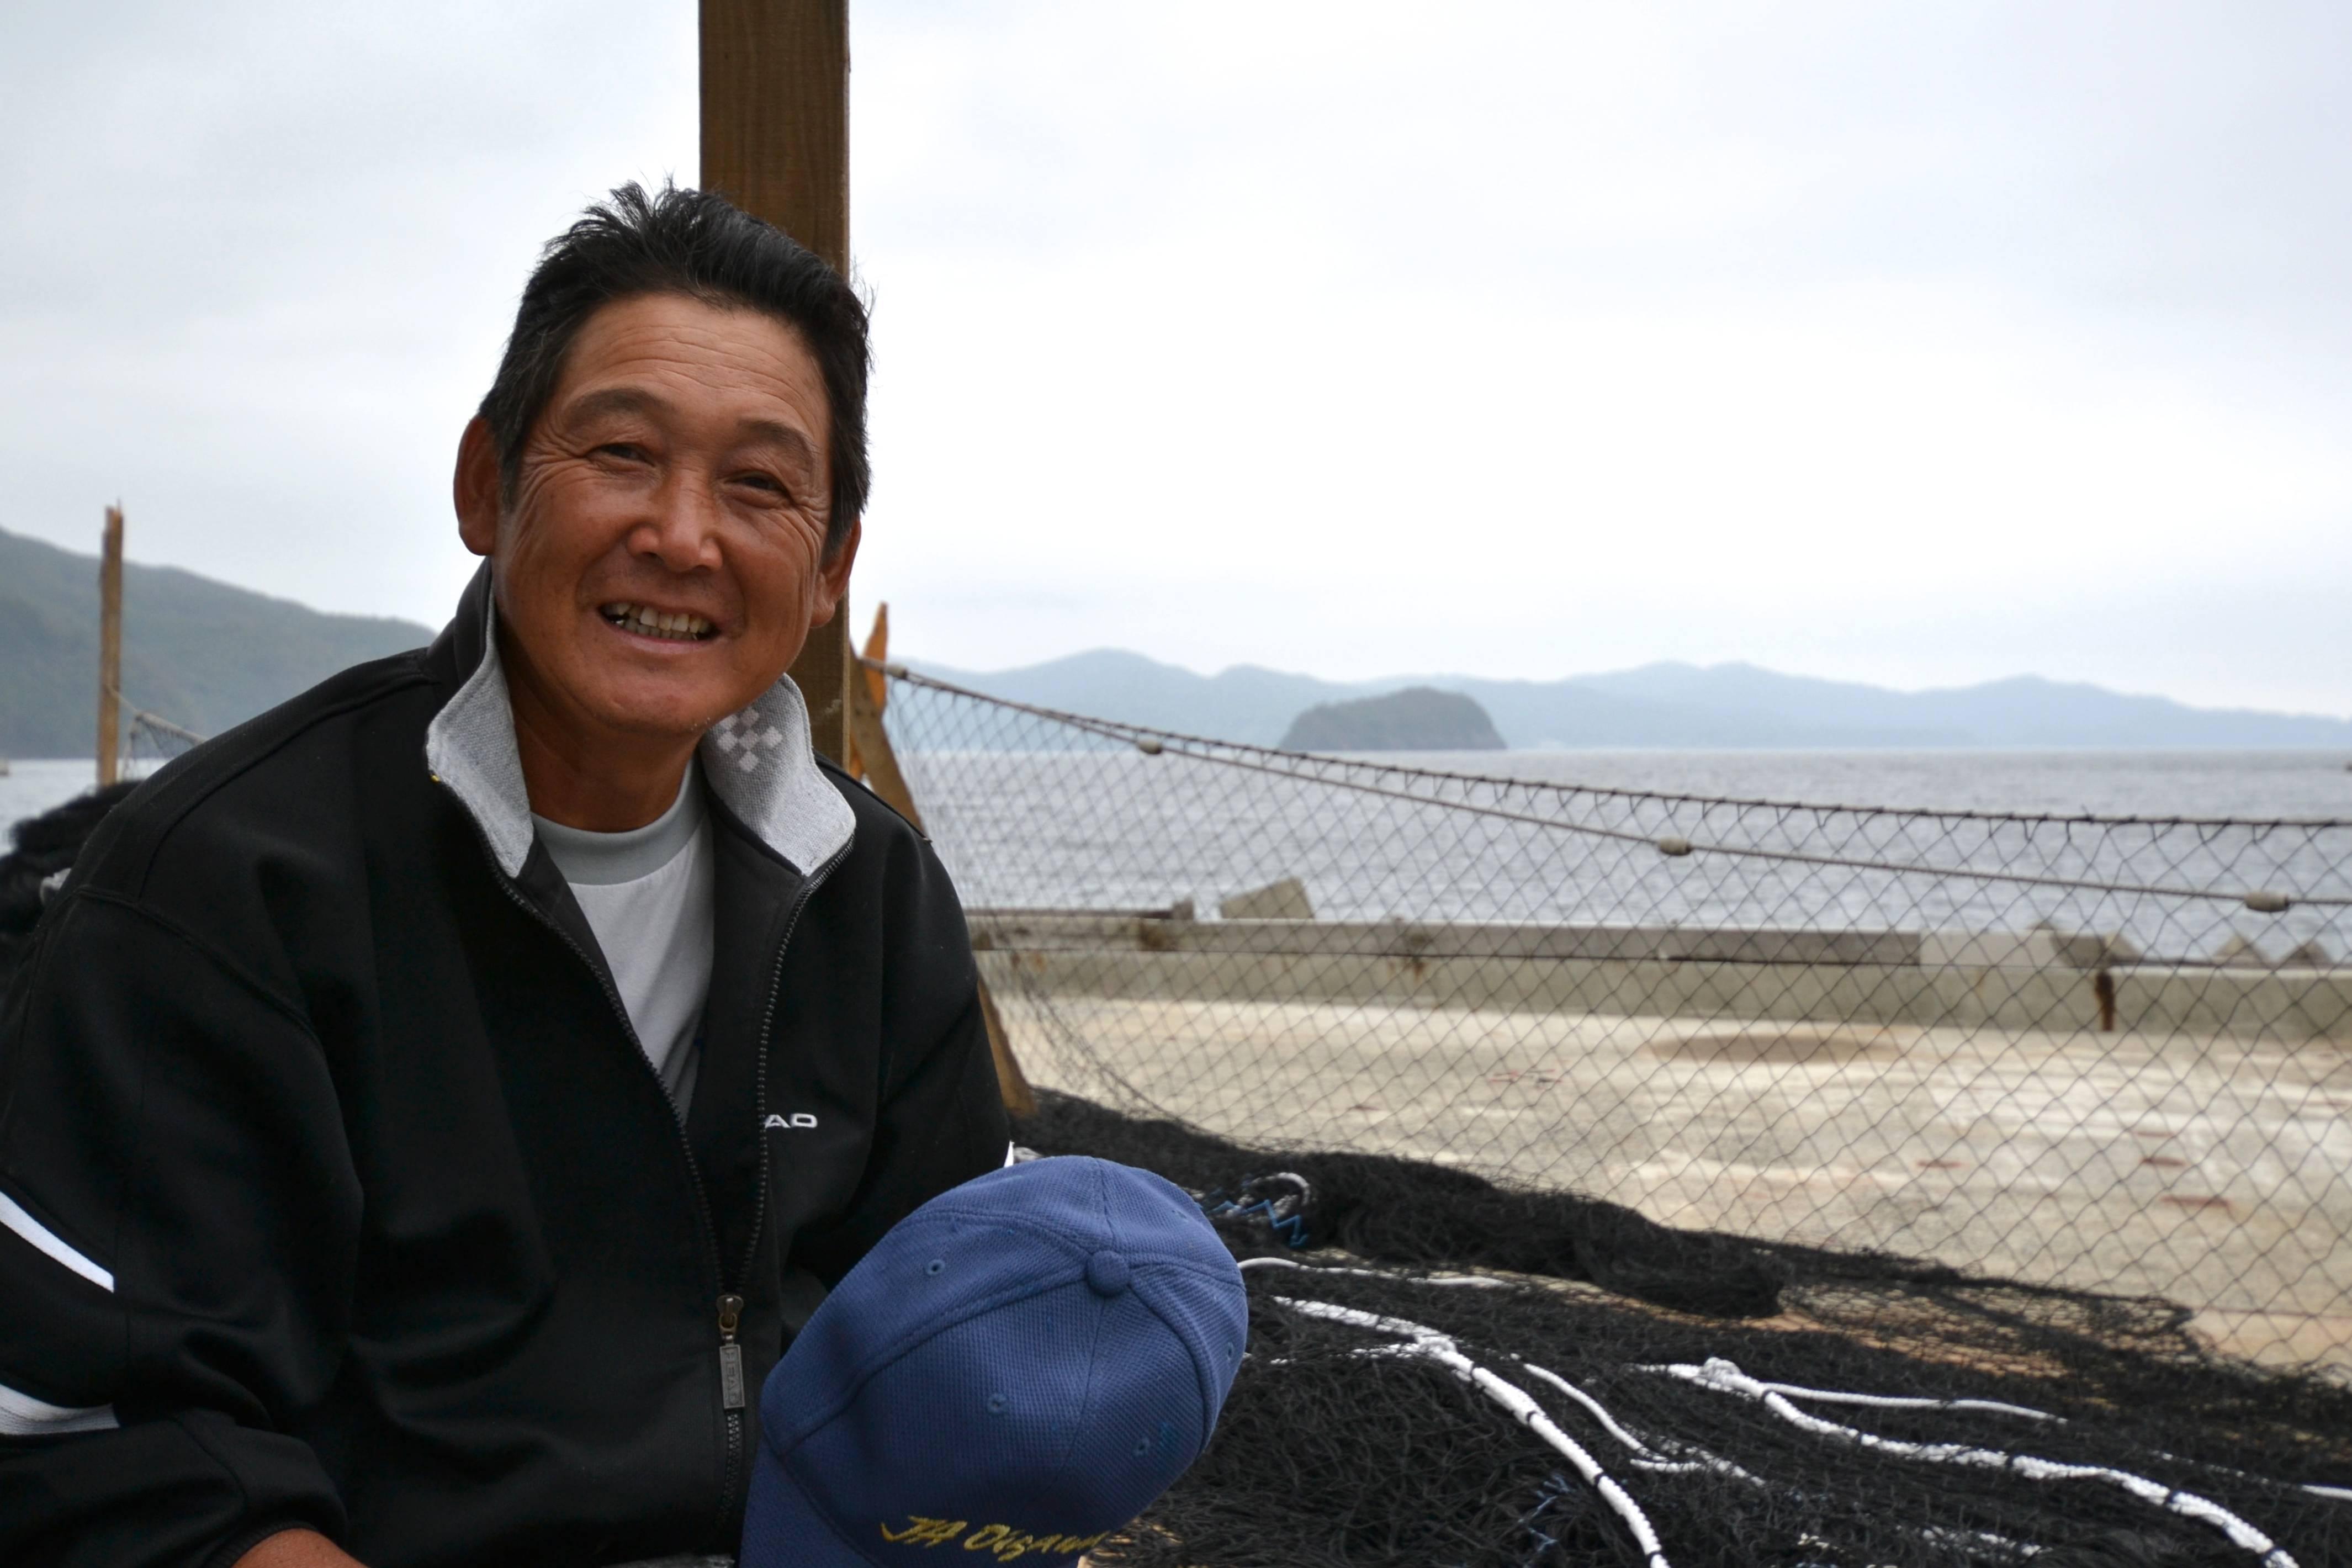 naburi fisherman yamato smiles.jpg